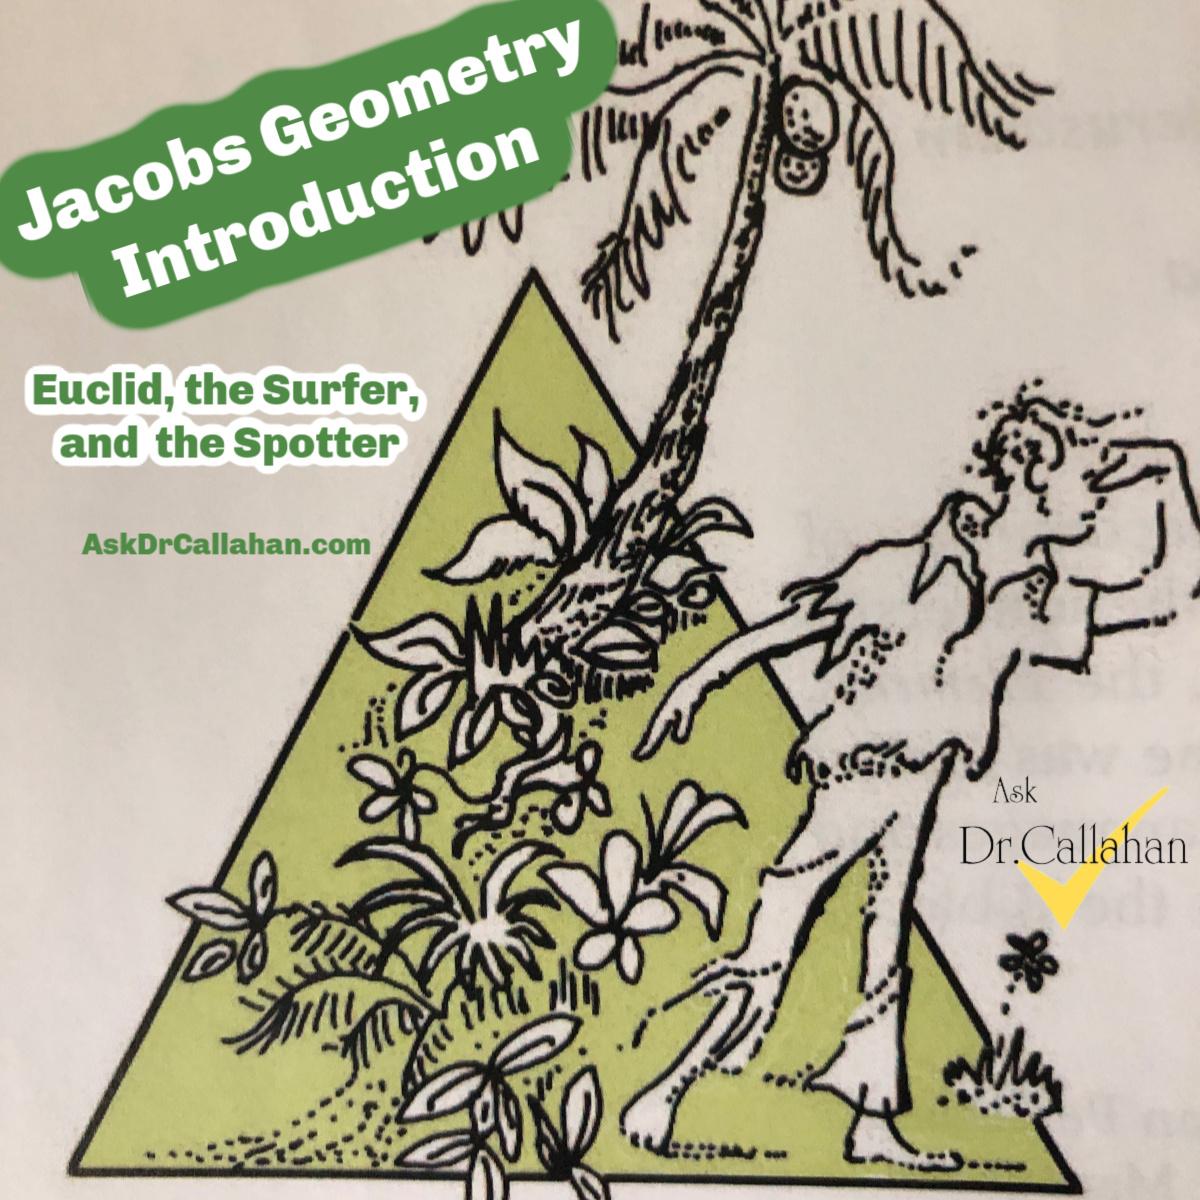 AskDrCallahan Jacobs Geometry Introduction